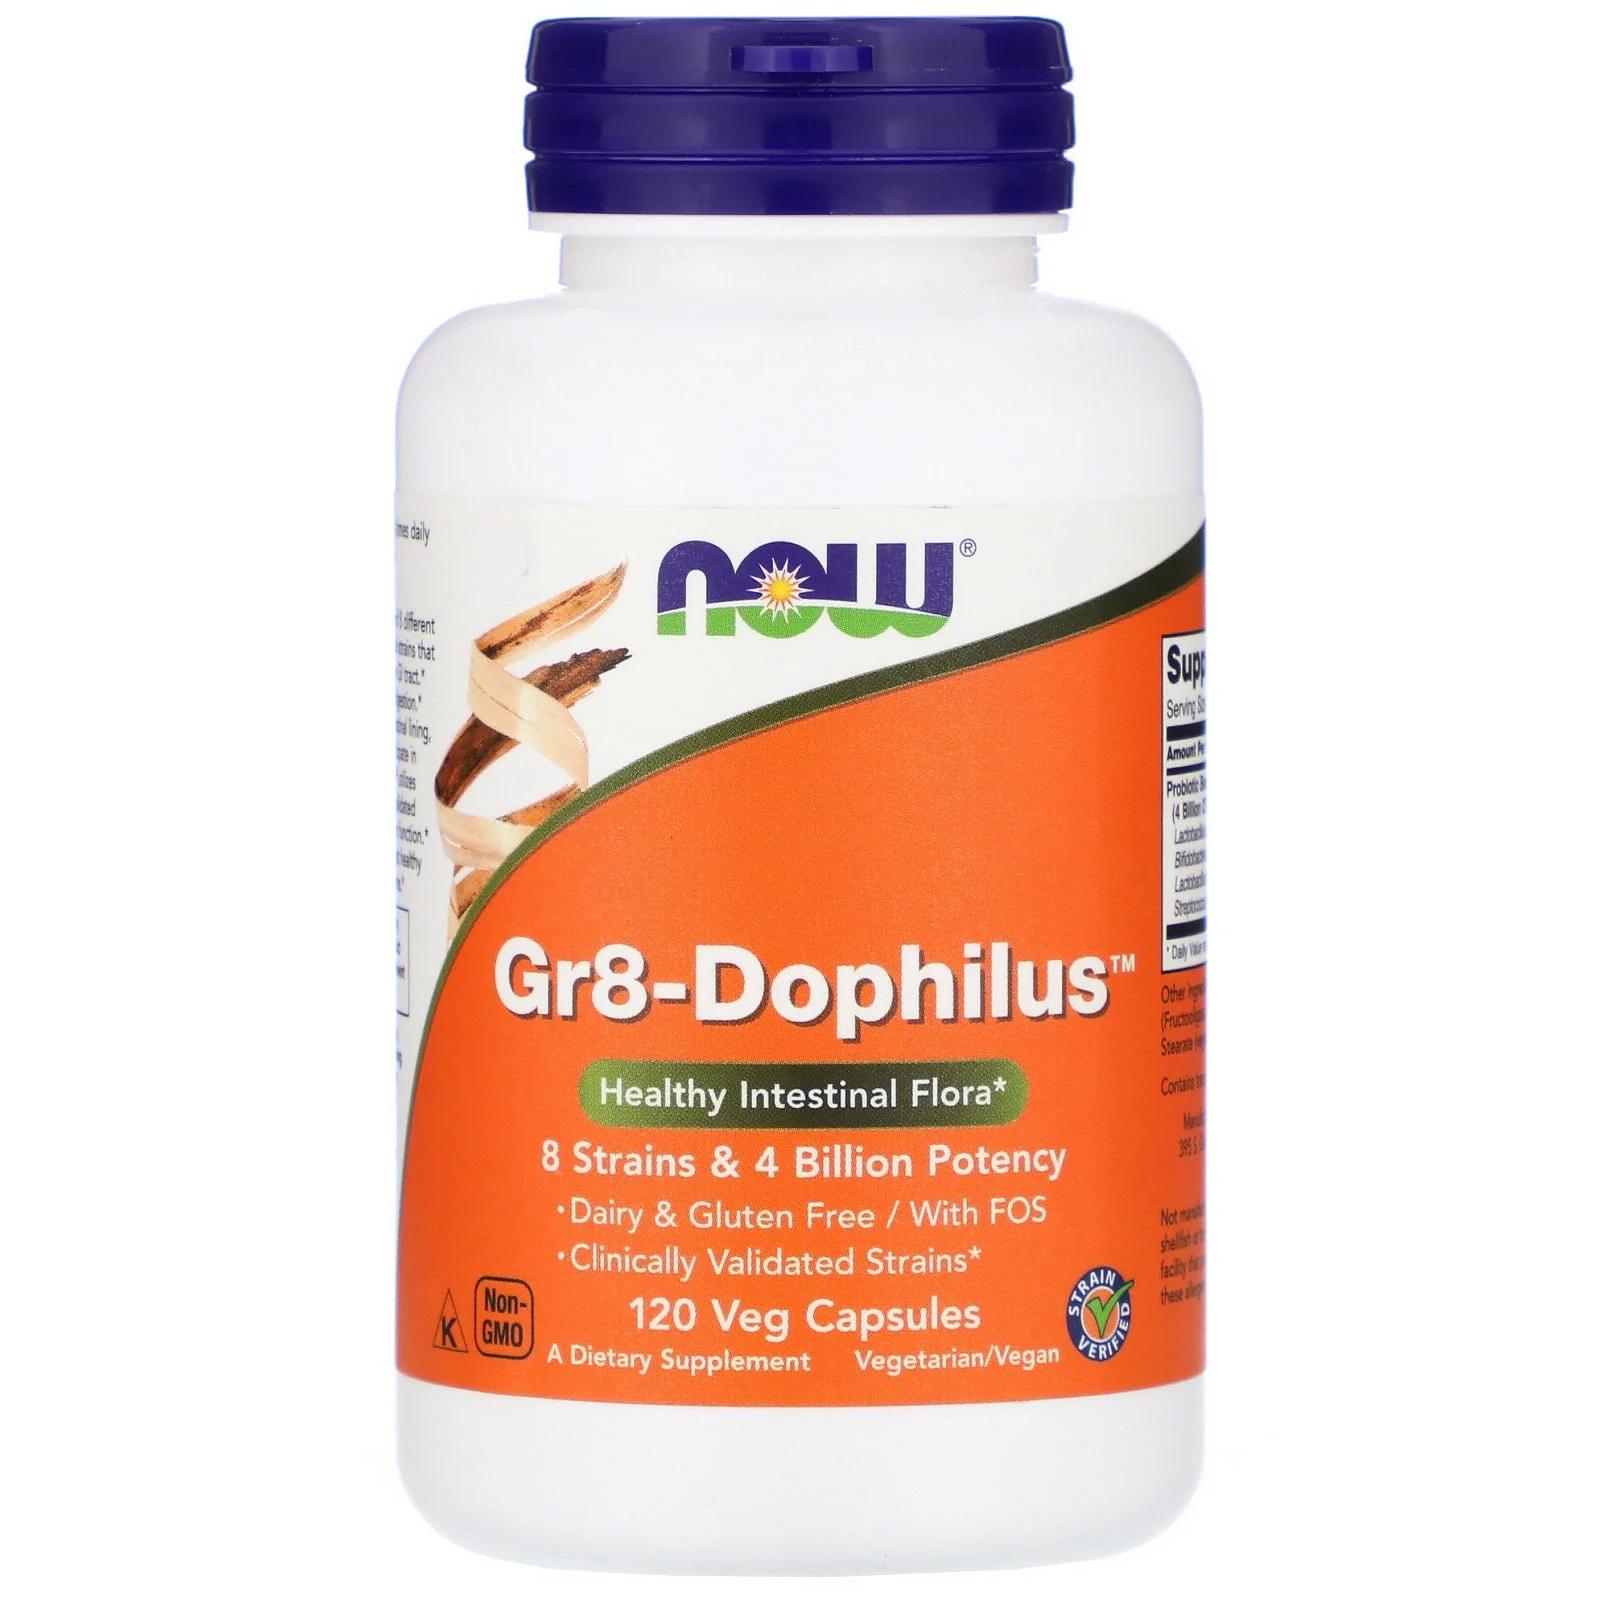 Image of Gr8-Dophilus (120 Vegetarian Capsules) - Now Foods 0733739029102